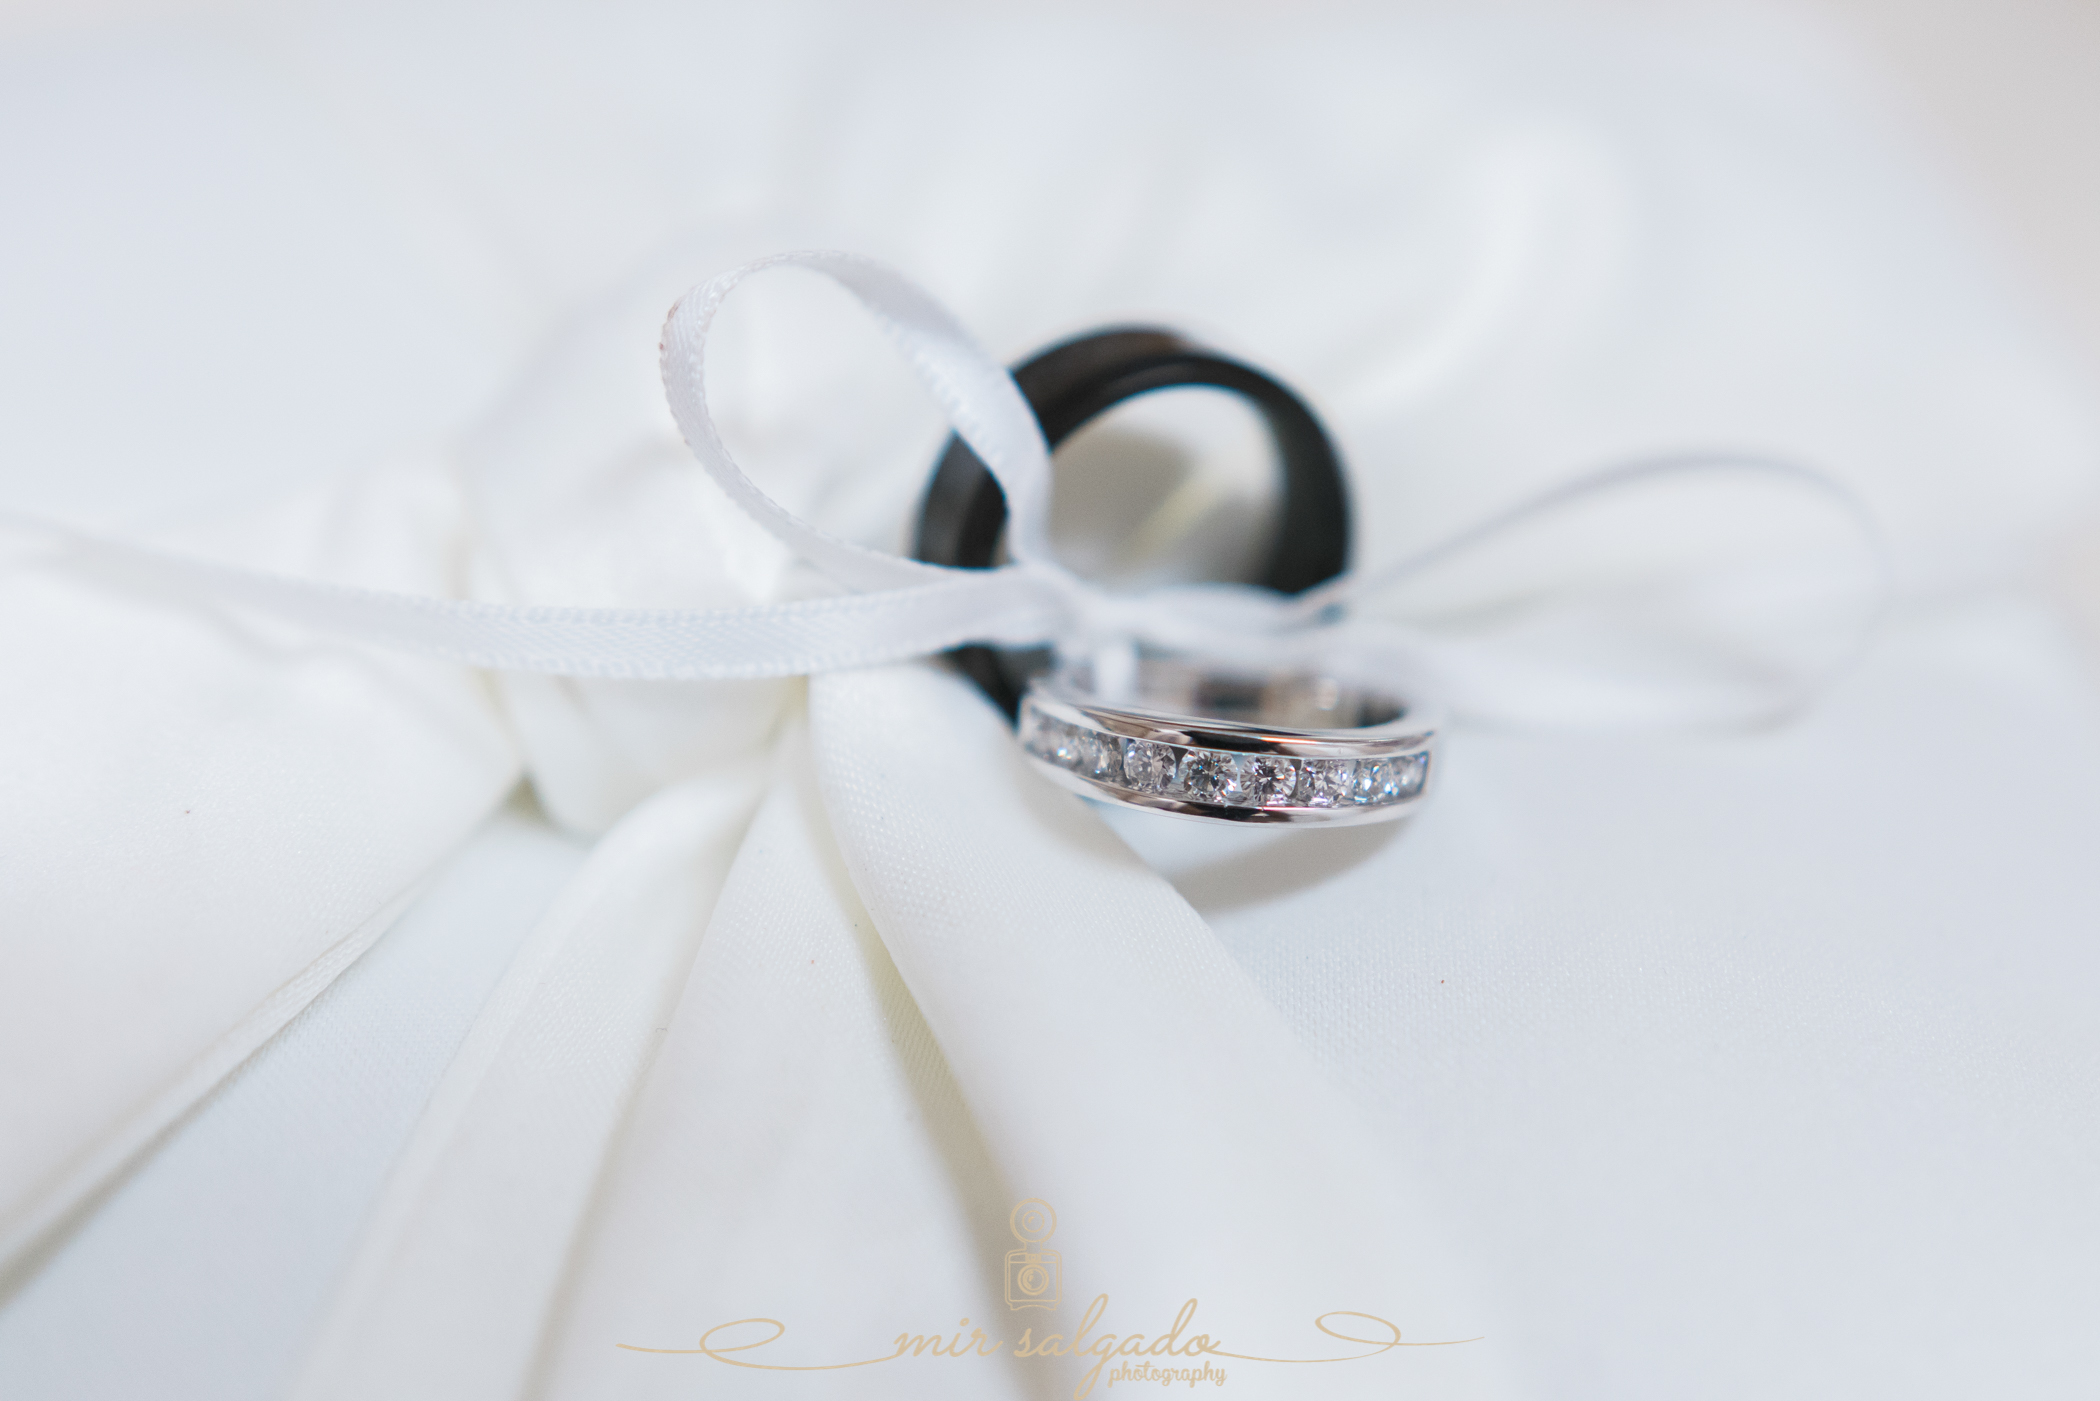 wedding-rings-photo, Bok-tower-gardens-weddingceremony